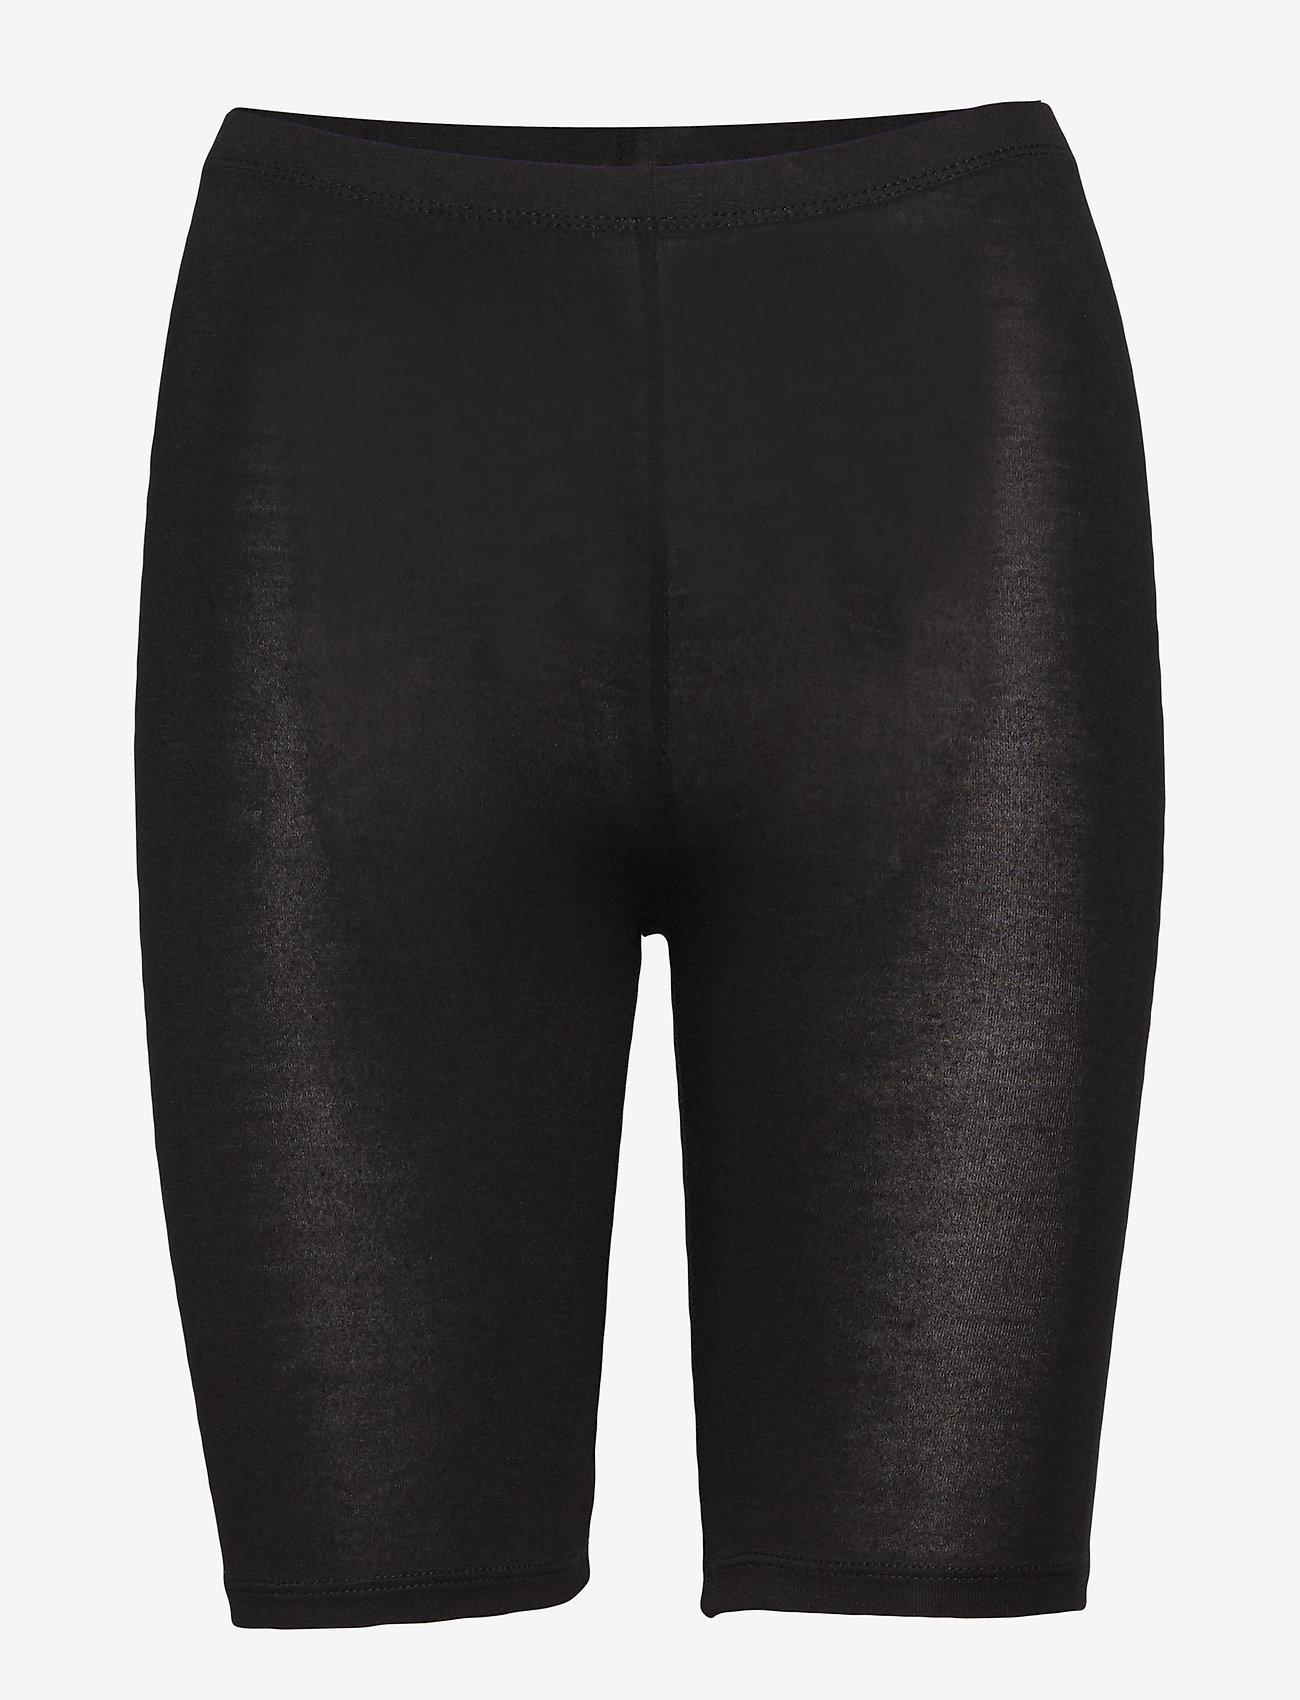 Decoy - DECOY shorts viscose stretch - bottoms - black - 0